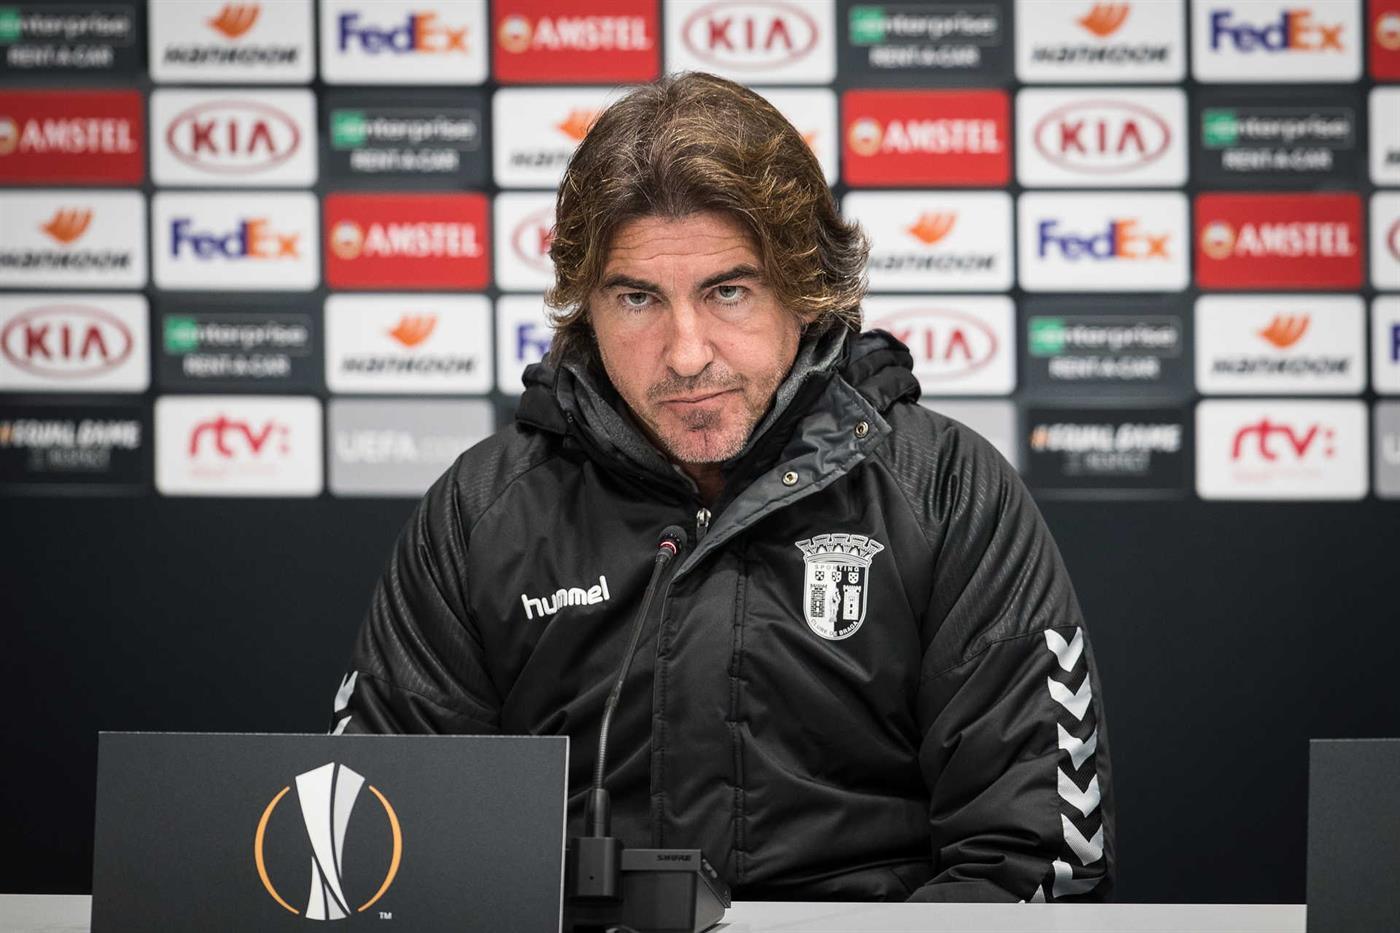 epa08063594 SC Braga's head coach Ricardo Sa Pinto attends a press conference at the Tehelne pole stadium